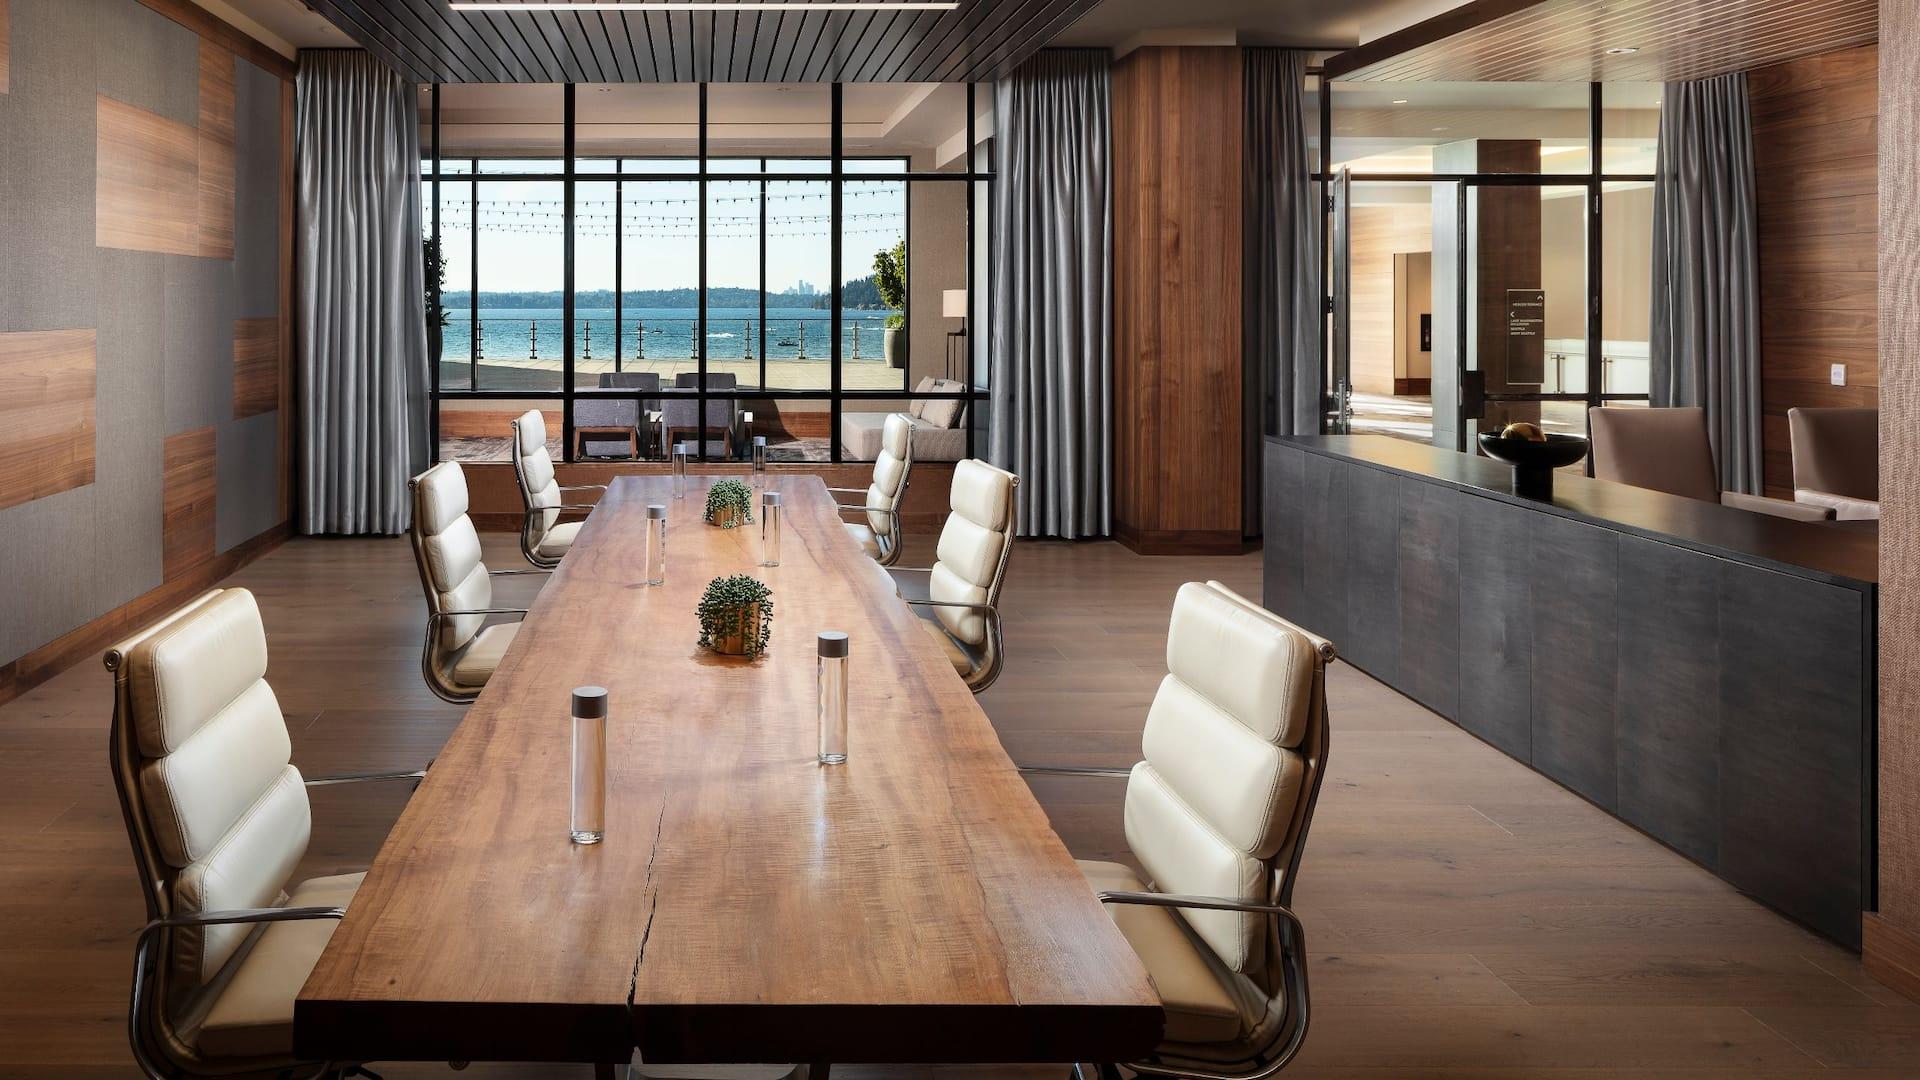 Executive Board Room Hyatt Regency Lake Washington at Seattle's Southport